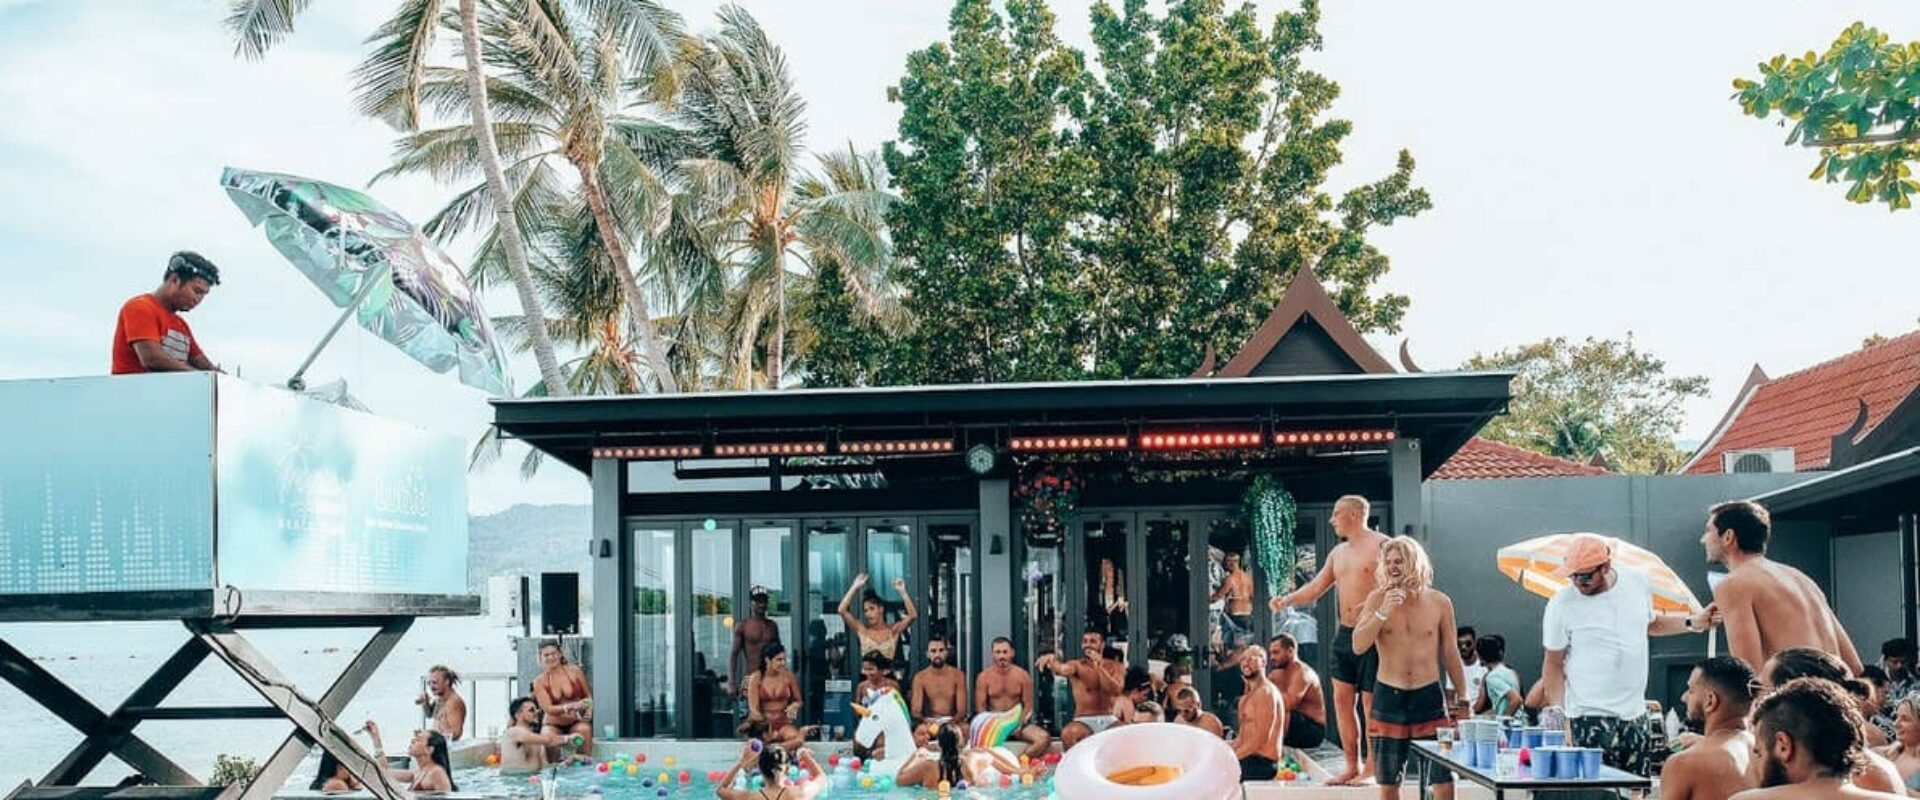 Saturdaze Pool Party